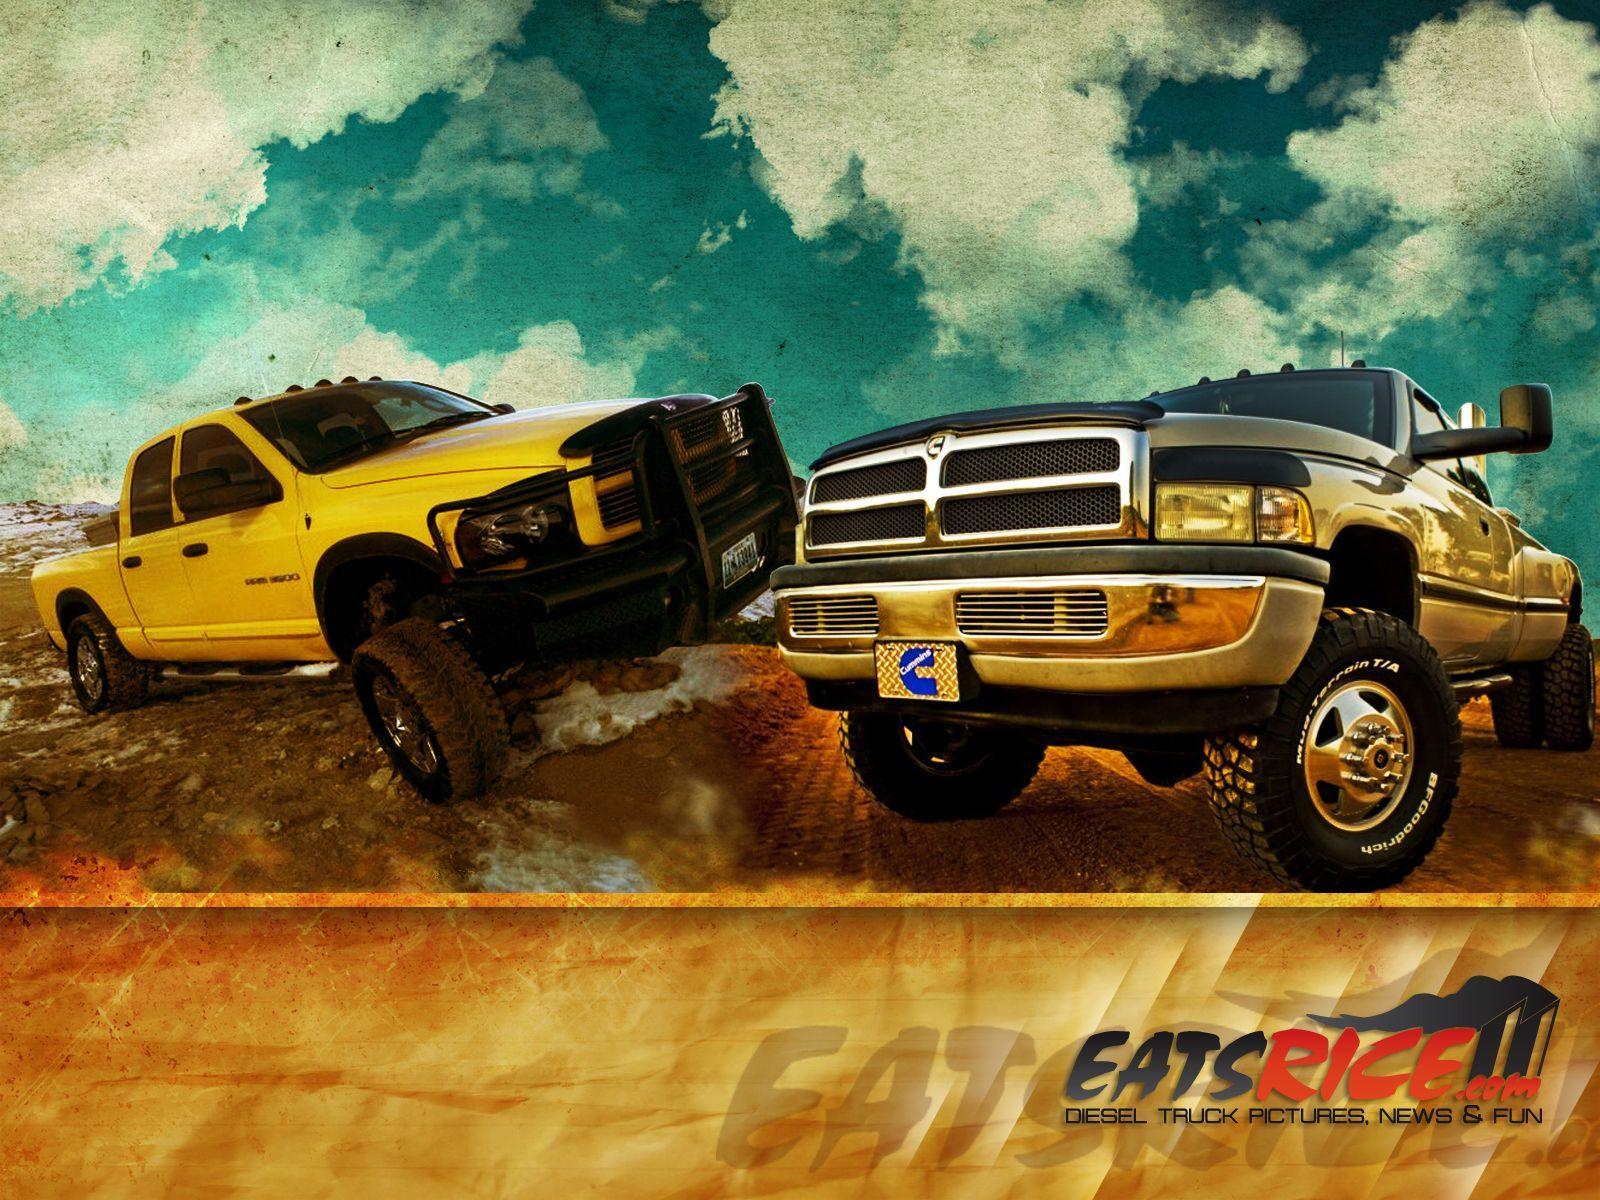 Diesel Truck Wallpapers   Top Diesel Truck Backgrounds 1600x1200